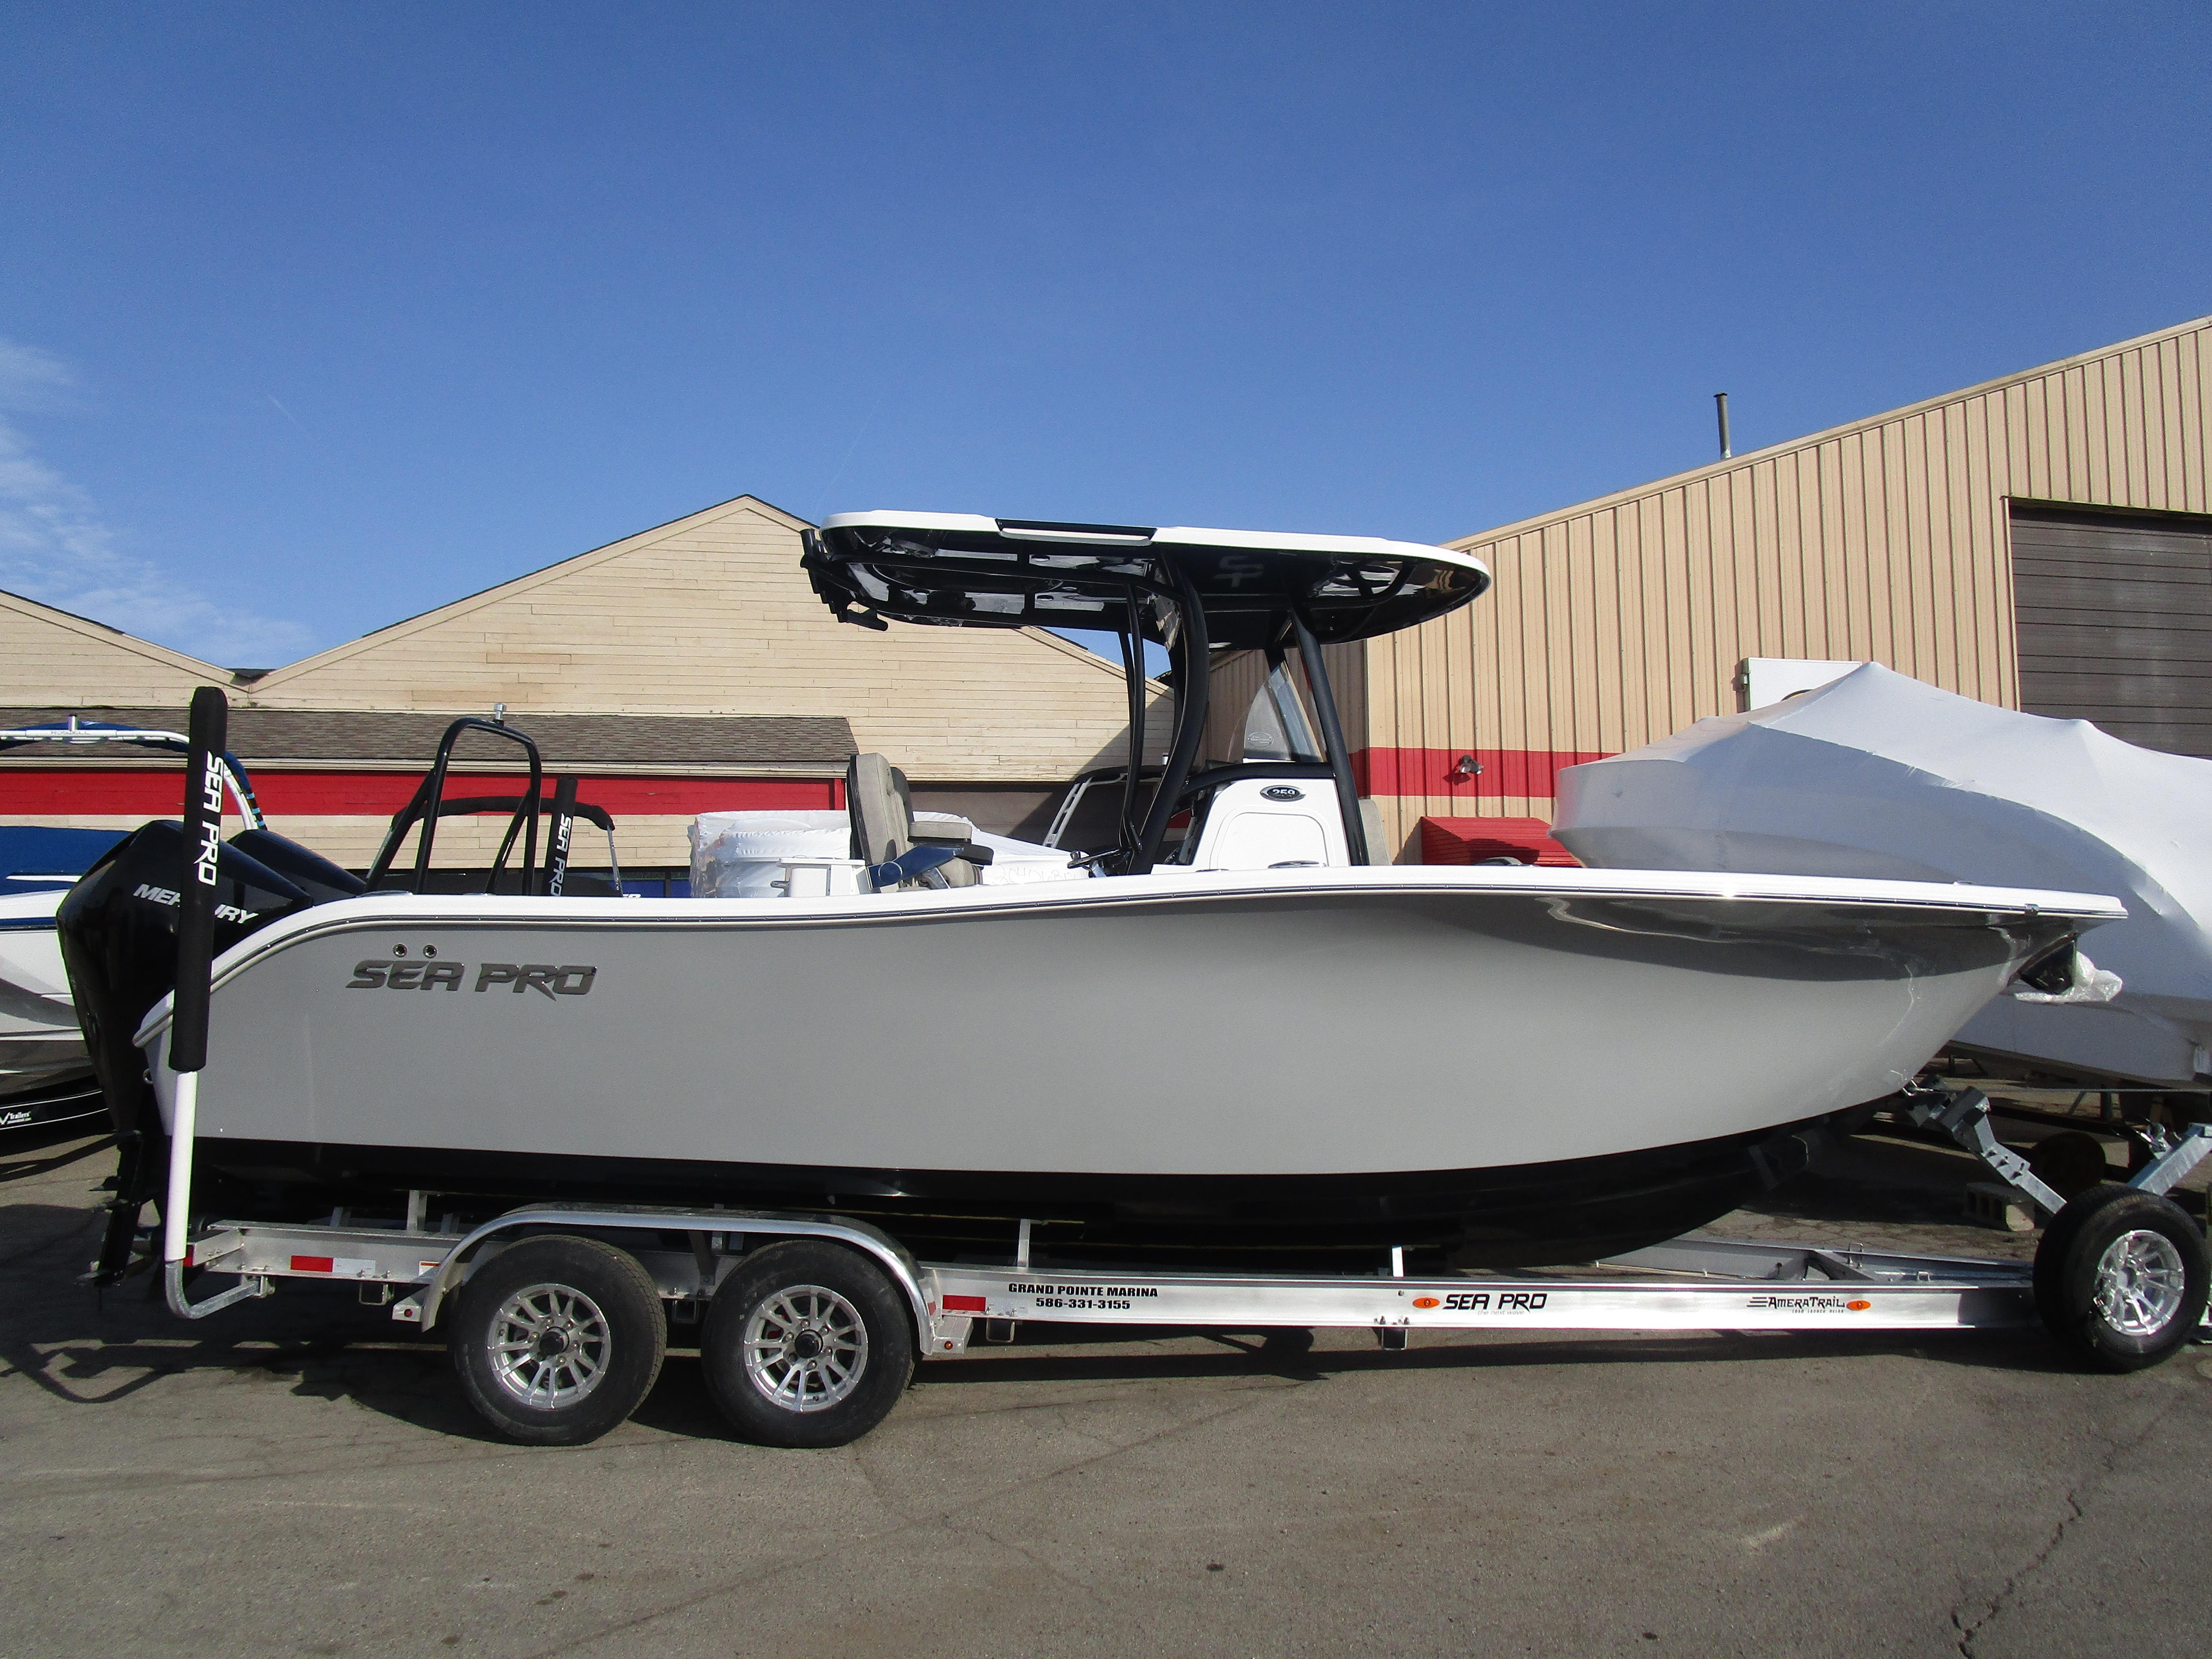 Sea Pro259 DLX